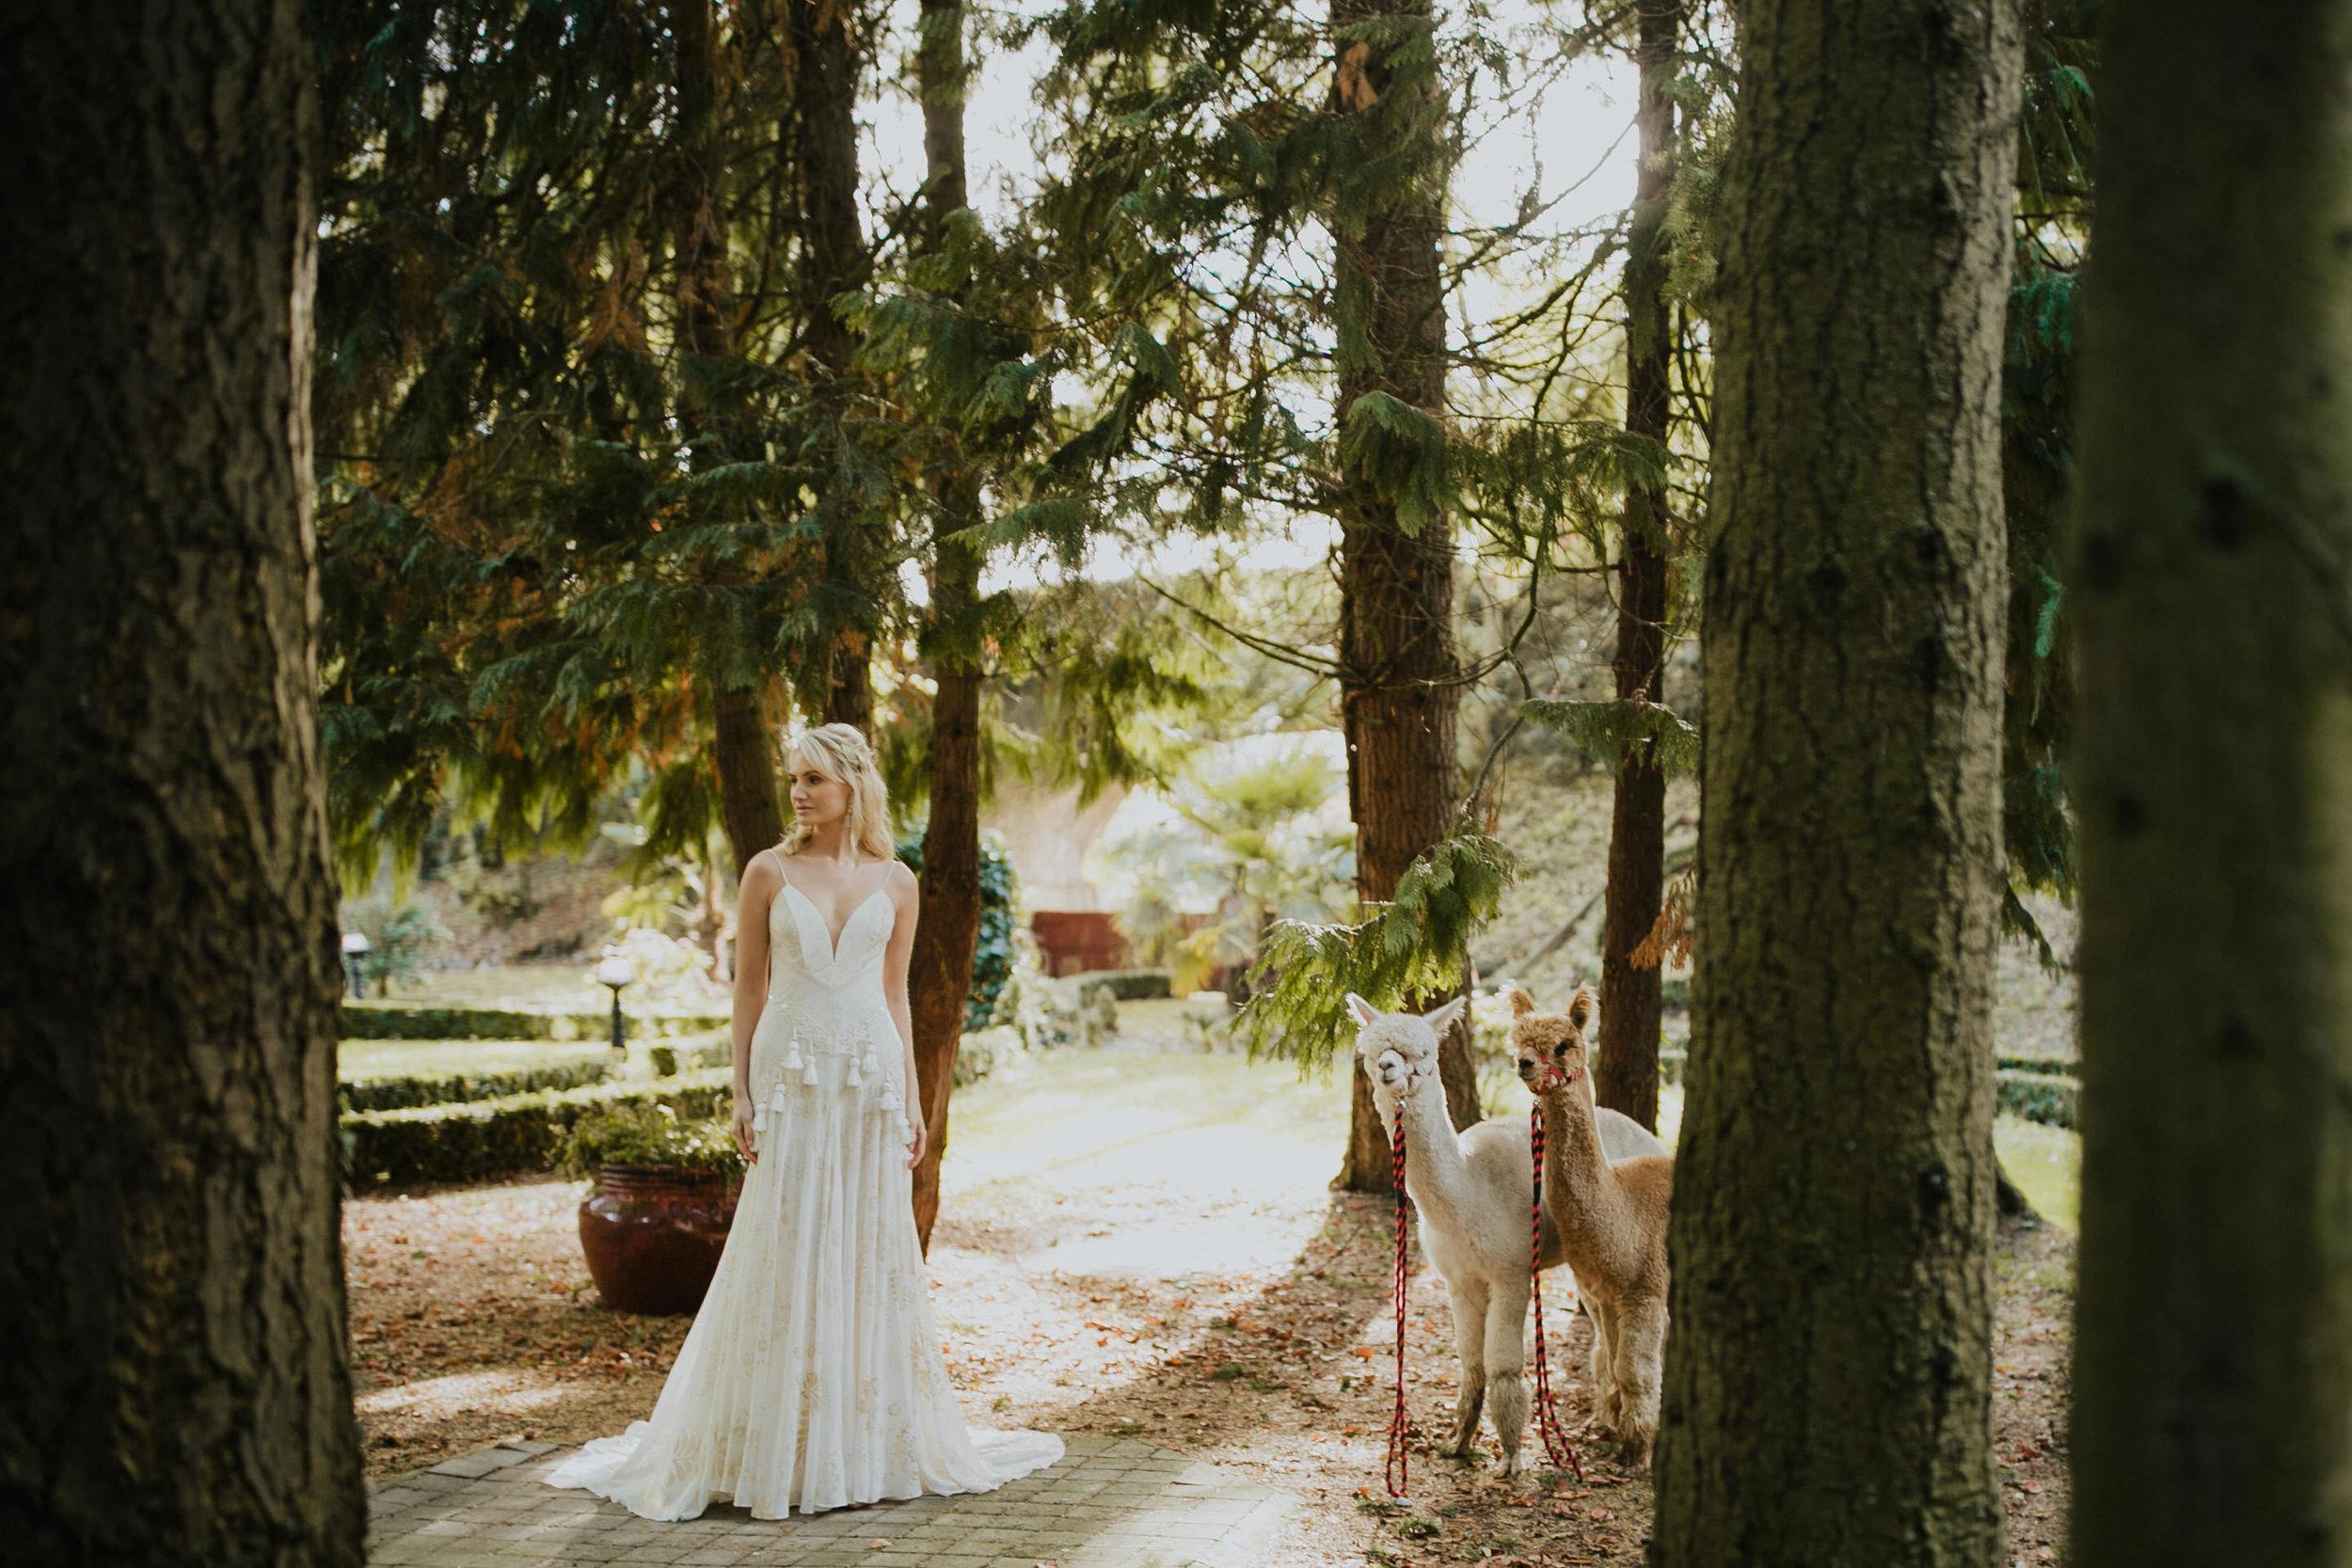 boho_wedding_alpaca_xpose_station_house_livia_figueiredo_photography_13.jpg